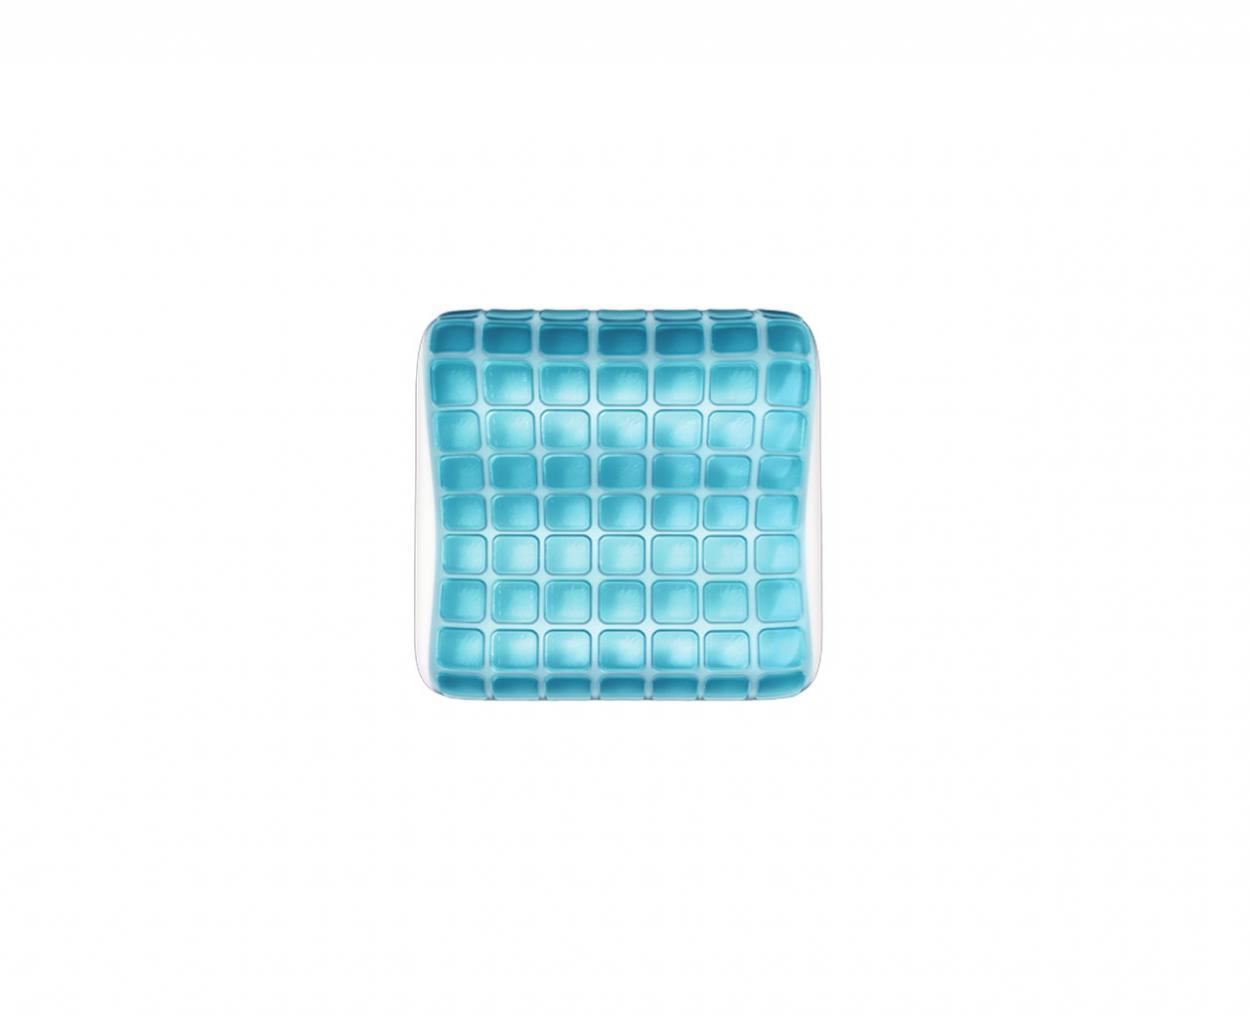 CandiaStrom - Μαξιλάρι Travel Pillow - Συλλογή TECHNOGEL COLLECTION - Γενική Εικόνα 3